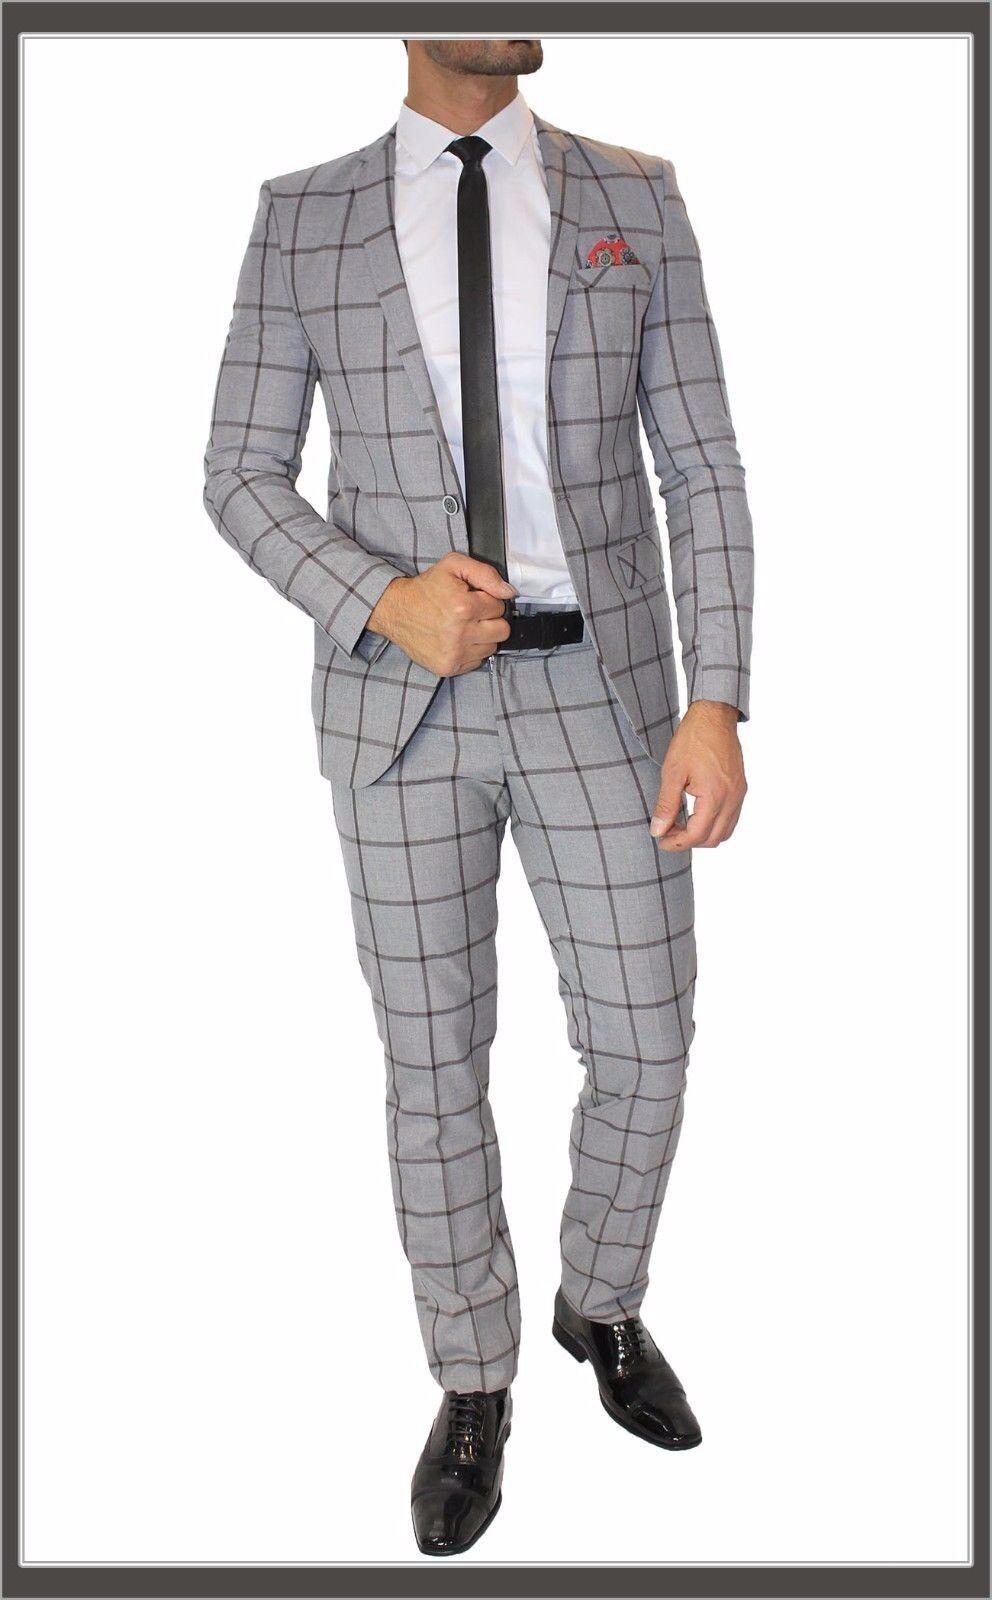 Fc Plus  Anzug Set Kariert Tailliert Doppelschlitz Hemd Krawatte grau Karo 46